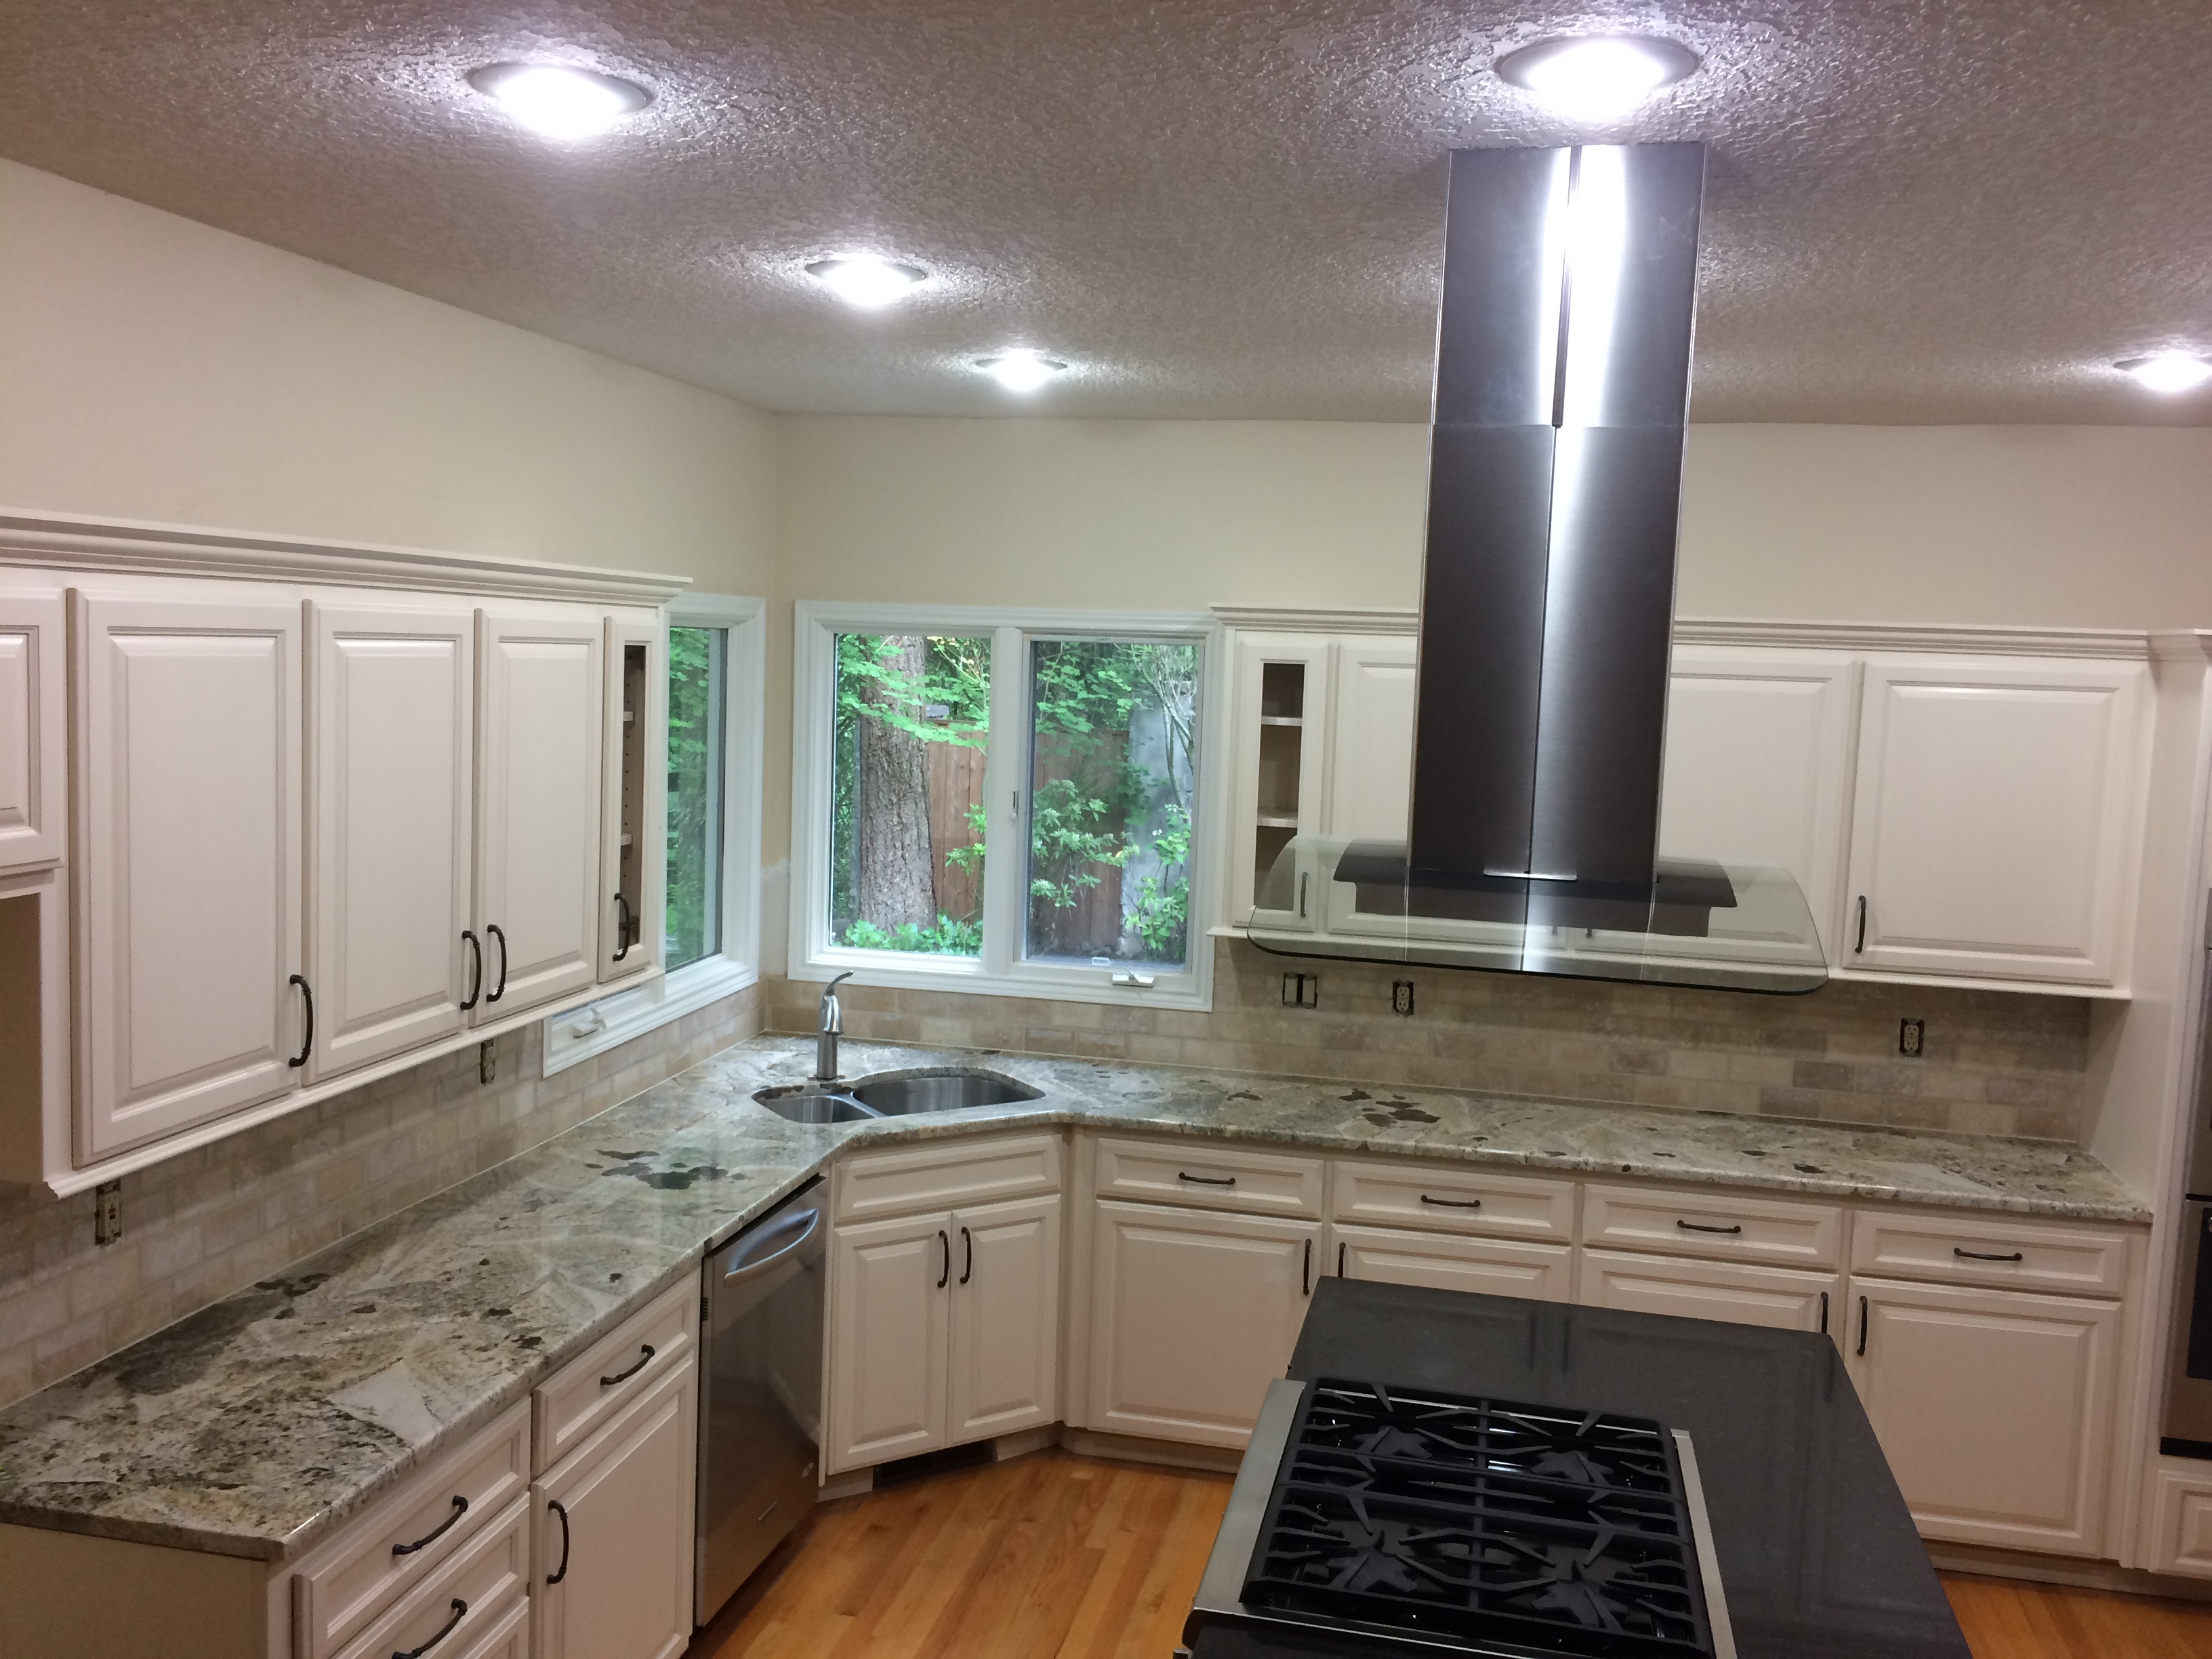 Quartz & Granite Countertops Inc. DBA Elegant Granite and Marble image 0